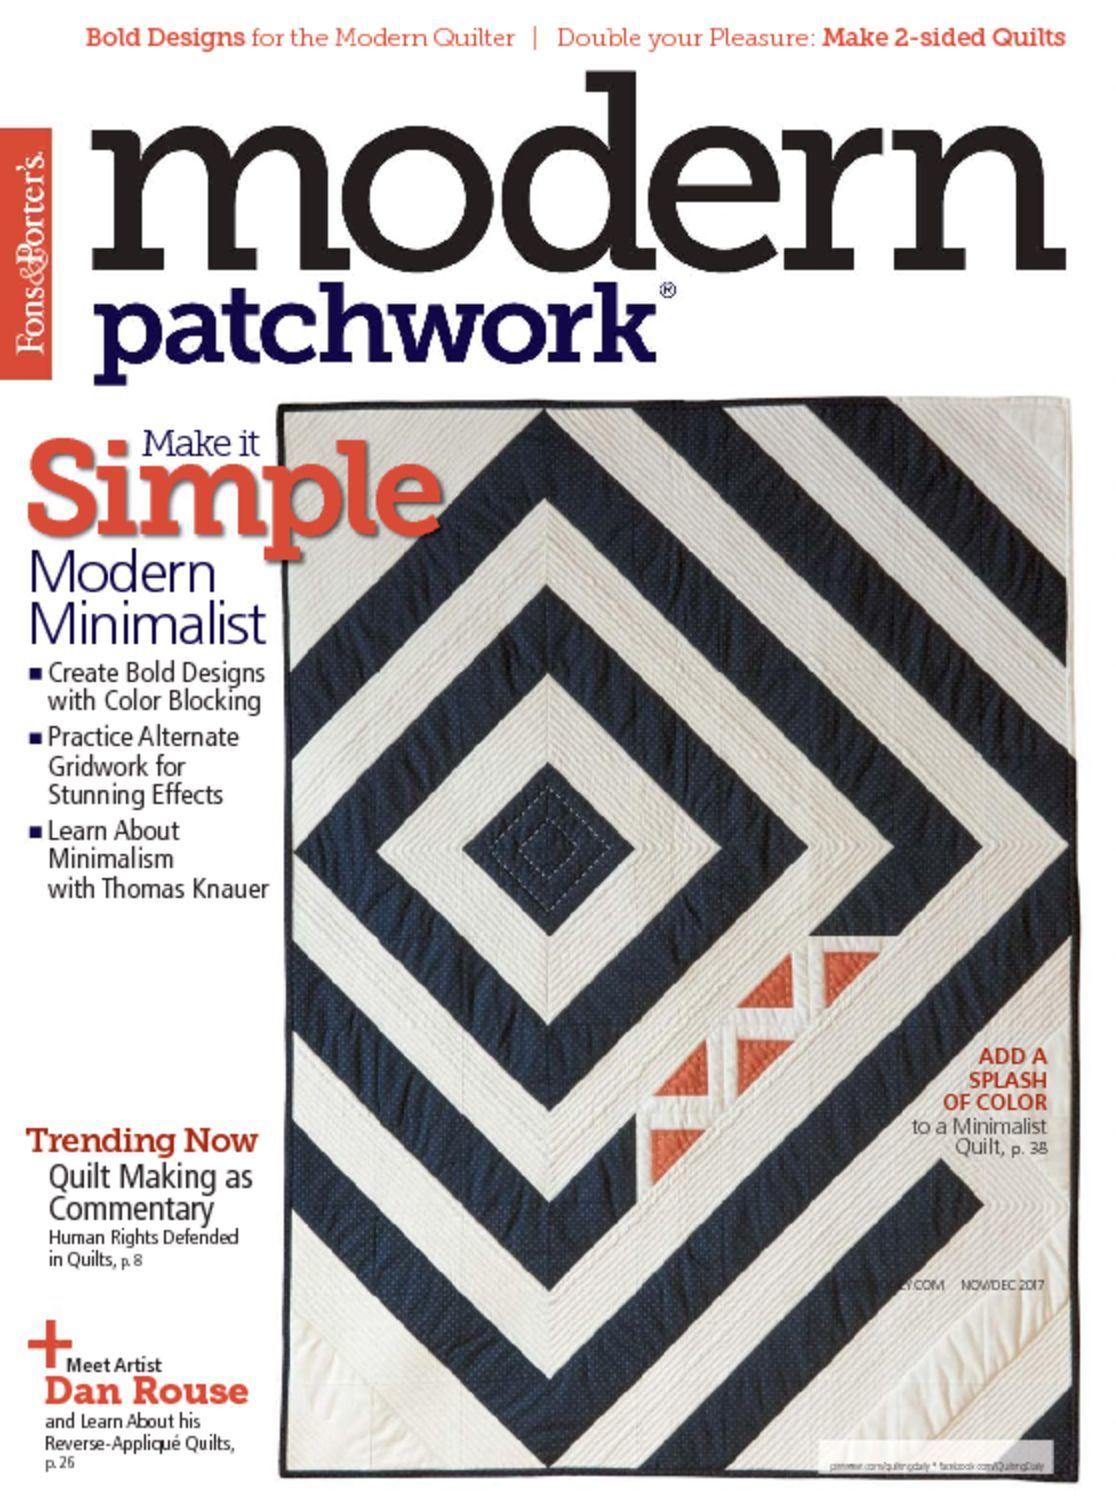 Modern Patchwork Magazine Digital Discountmags Com